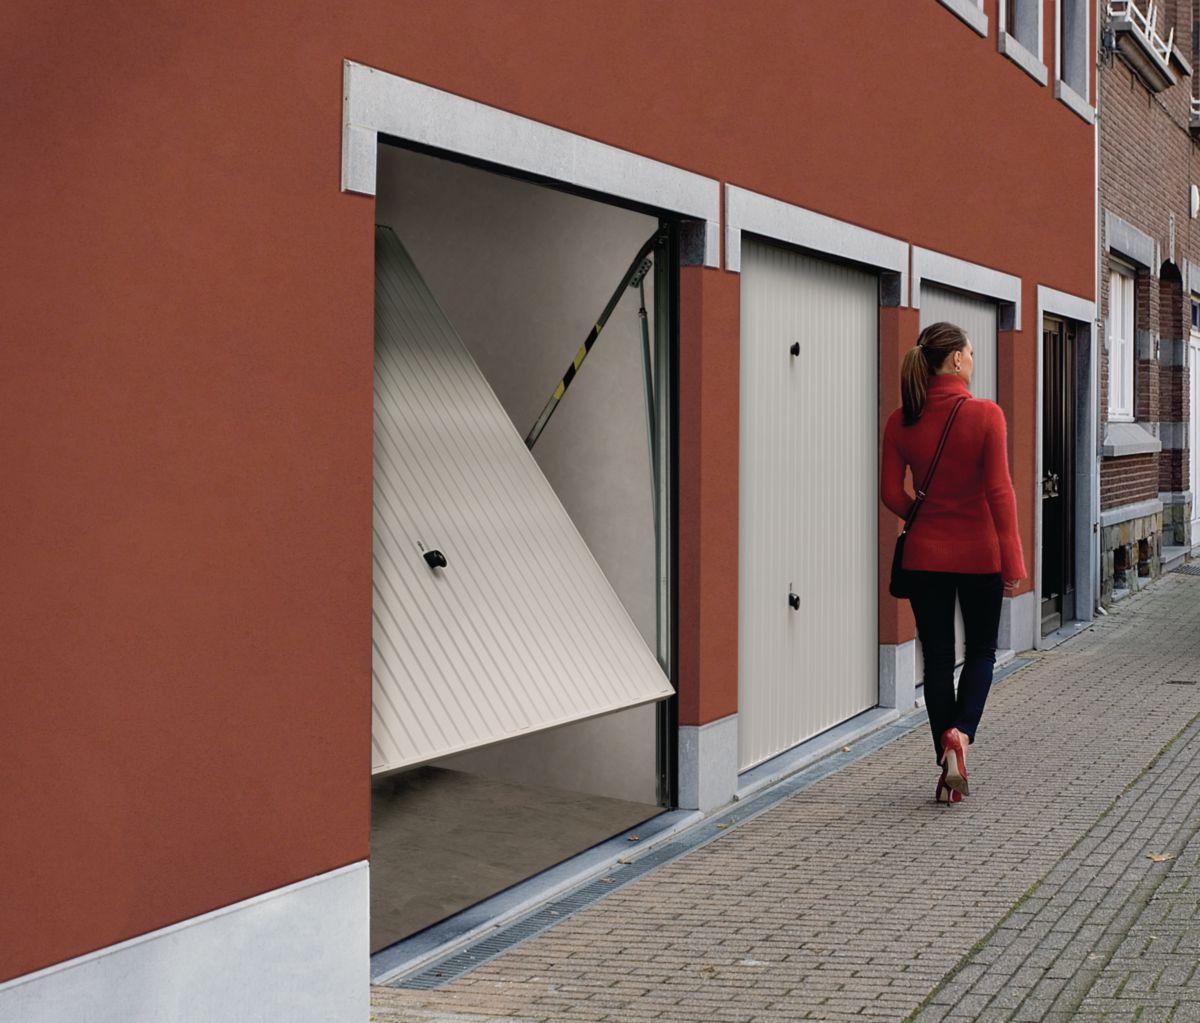 Tubauto distribution sas porte de garage basculante non d bordante sans rail motif 114 acier - Porte de garage basculante non debordante tubauto ...